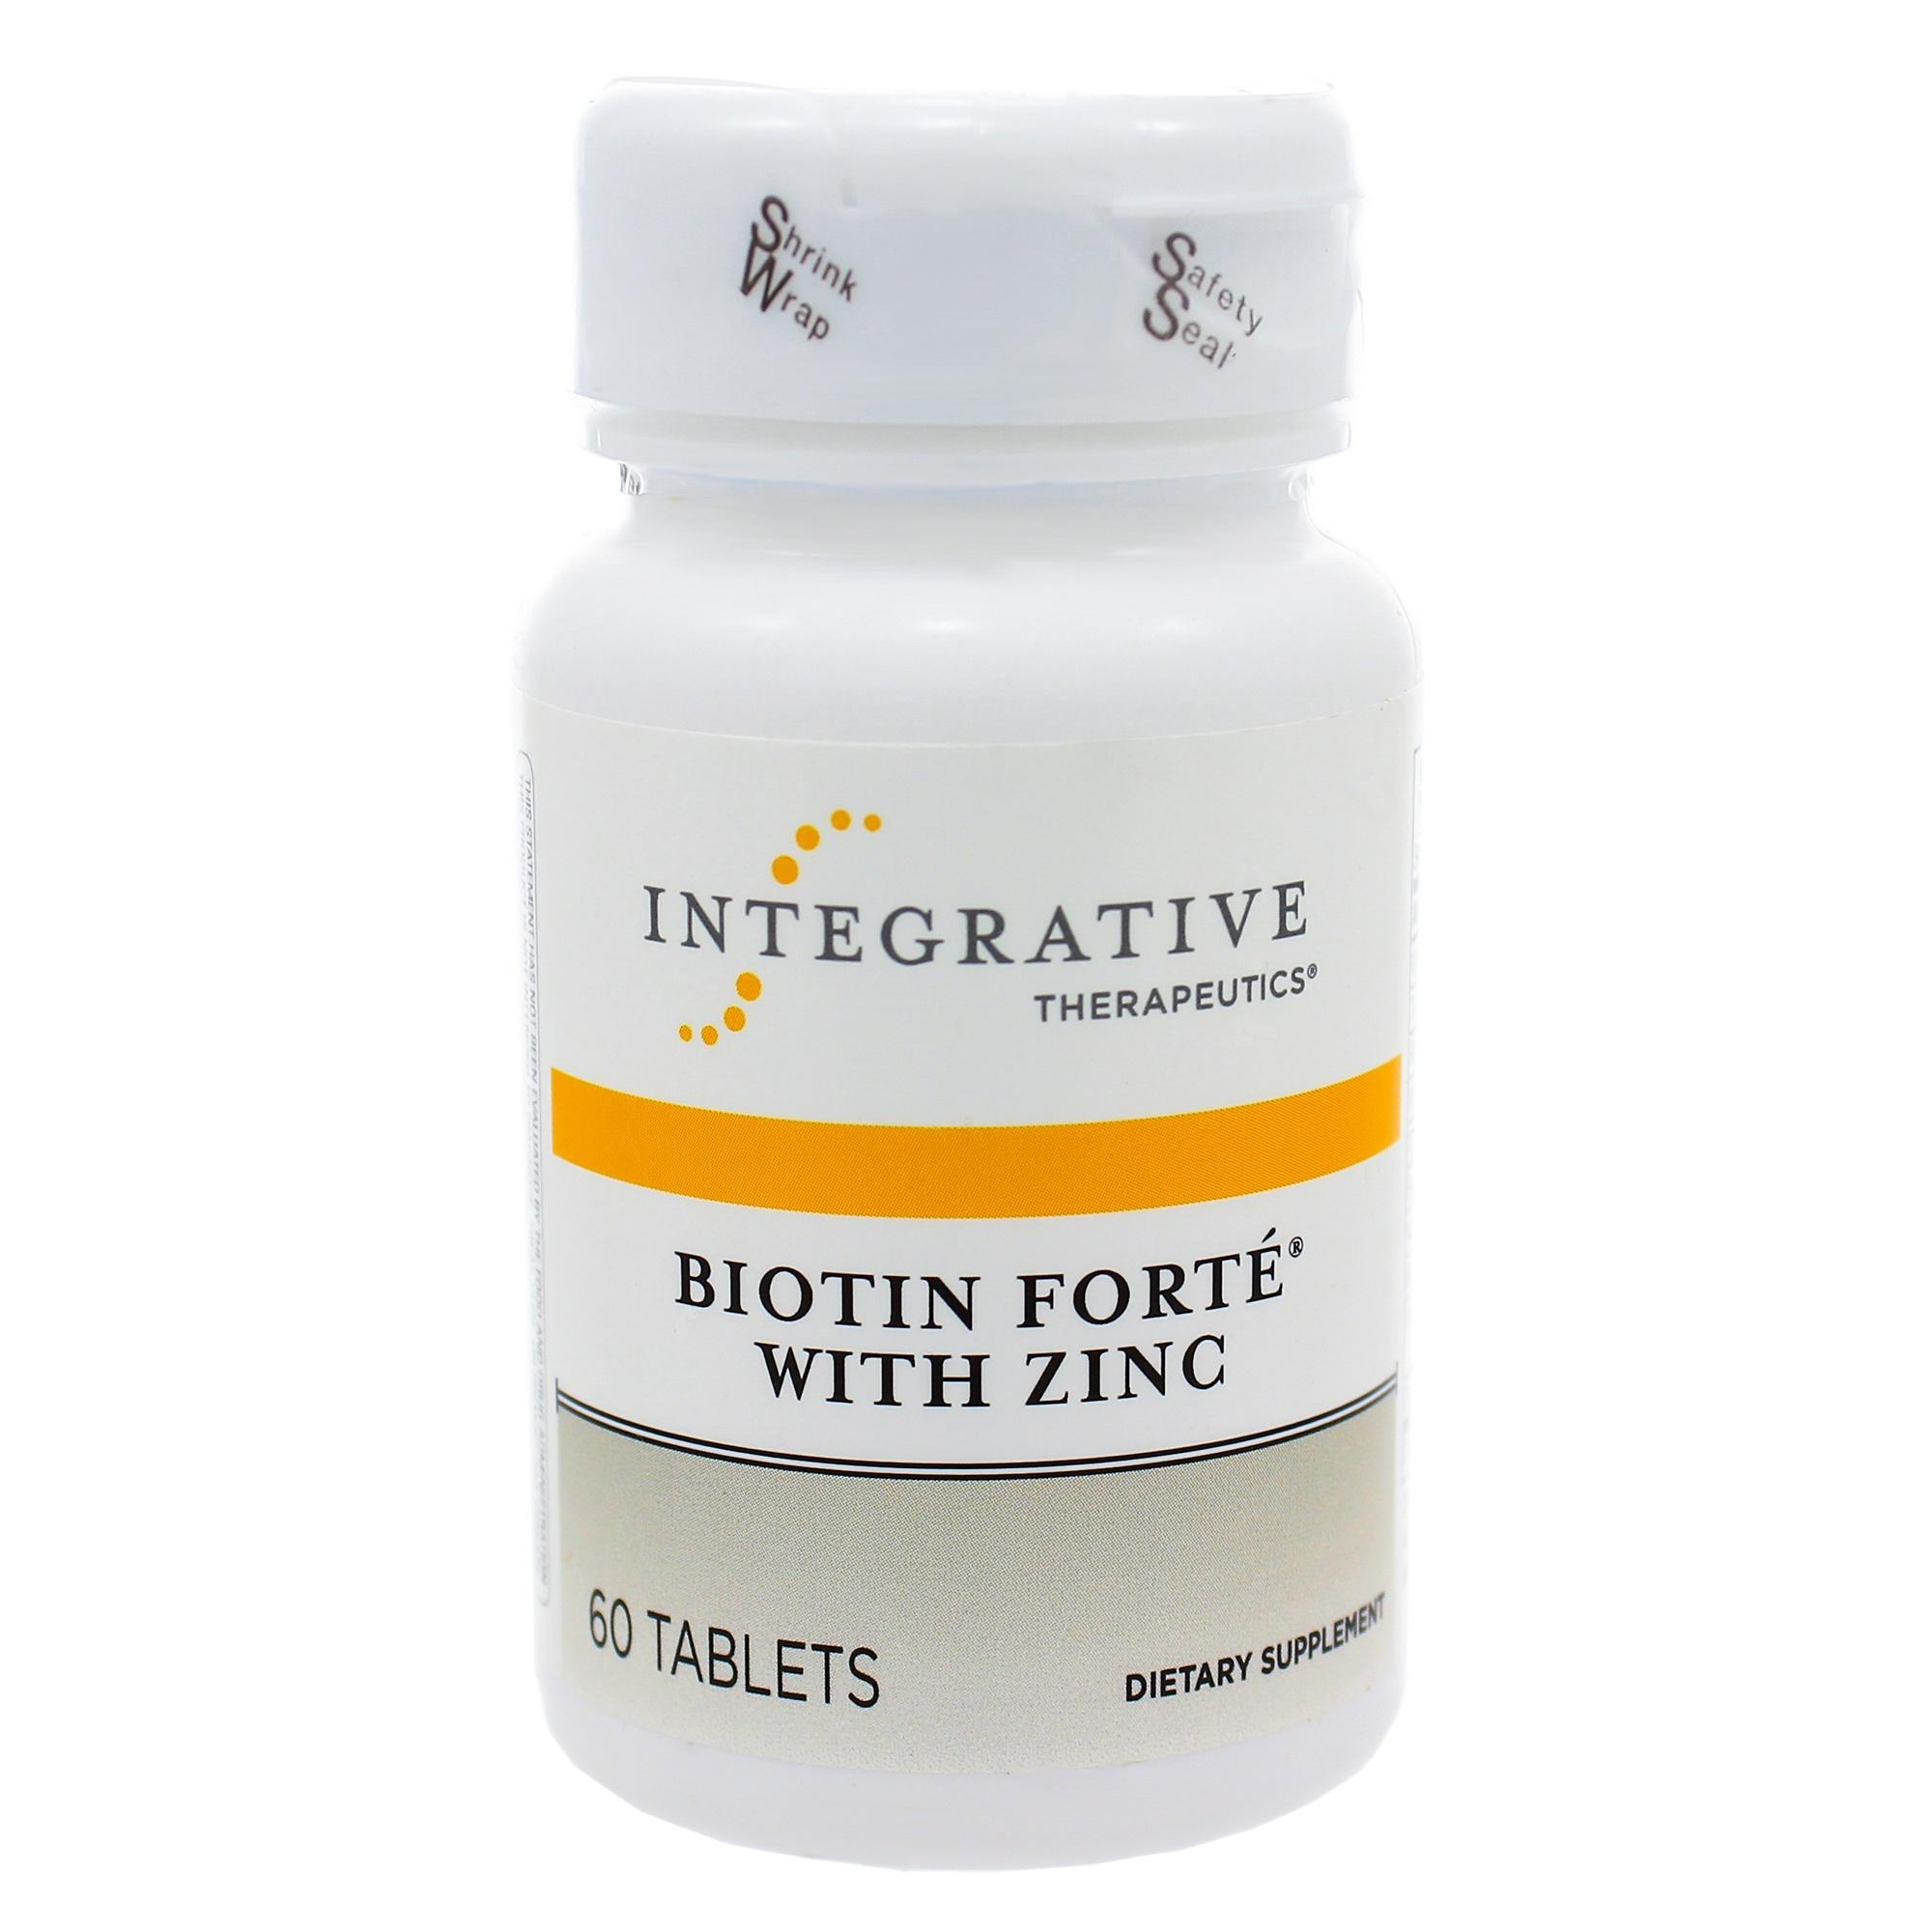 Biotin Forte w Zinc replaces Bio-Plus from Douglas Labs